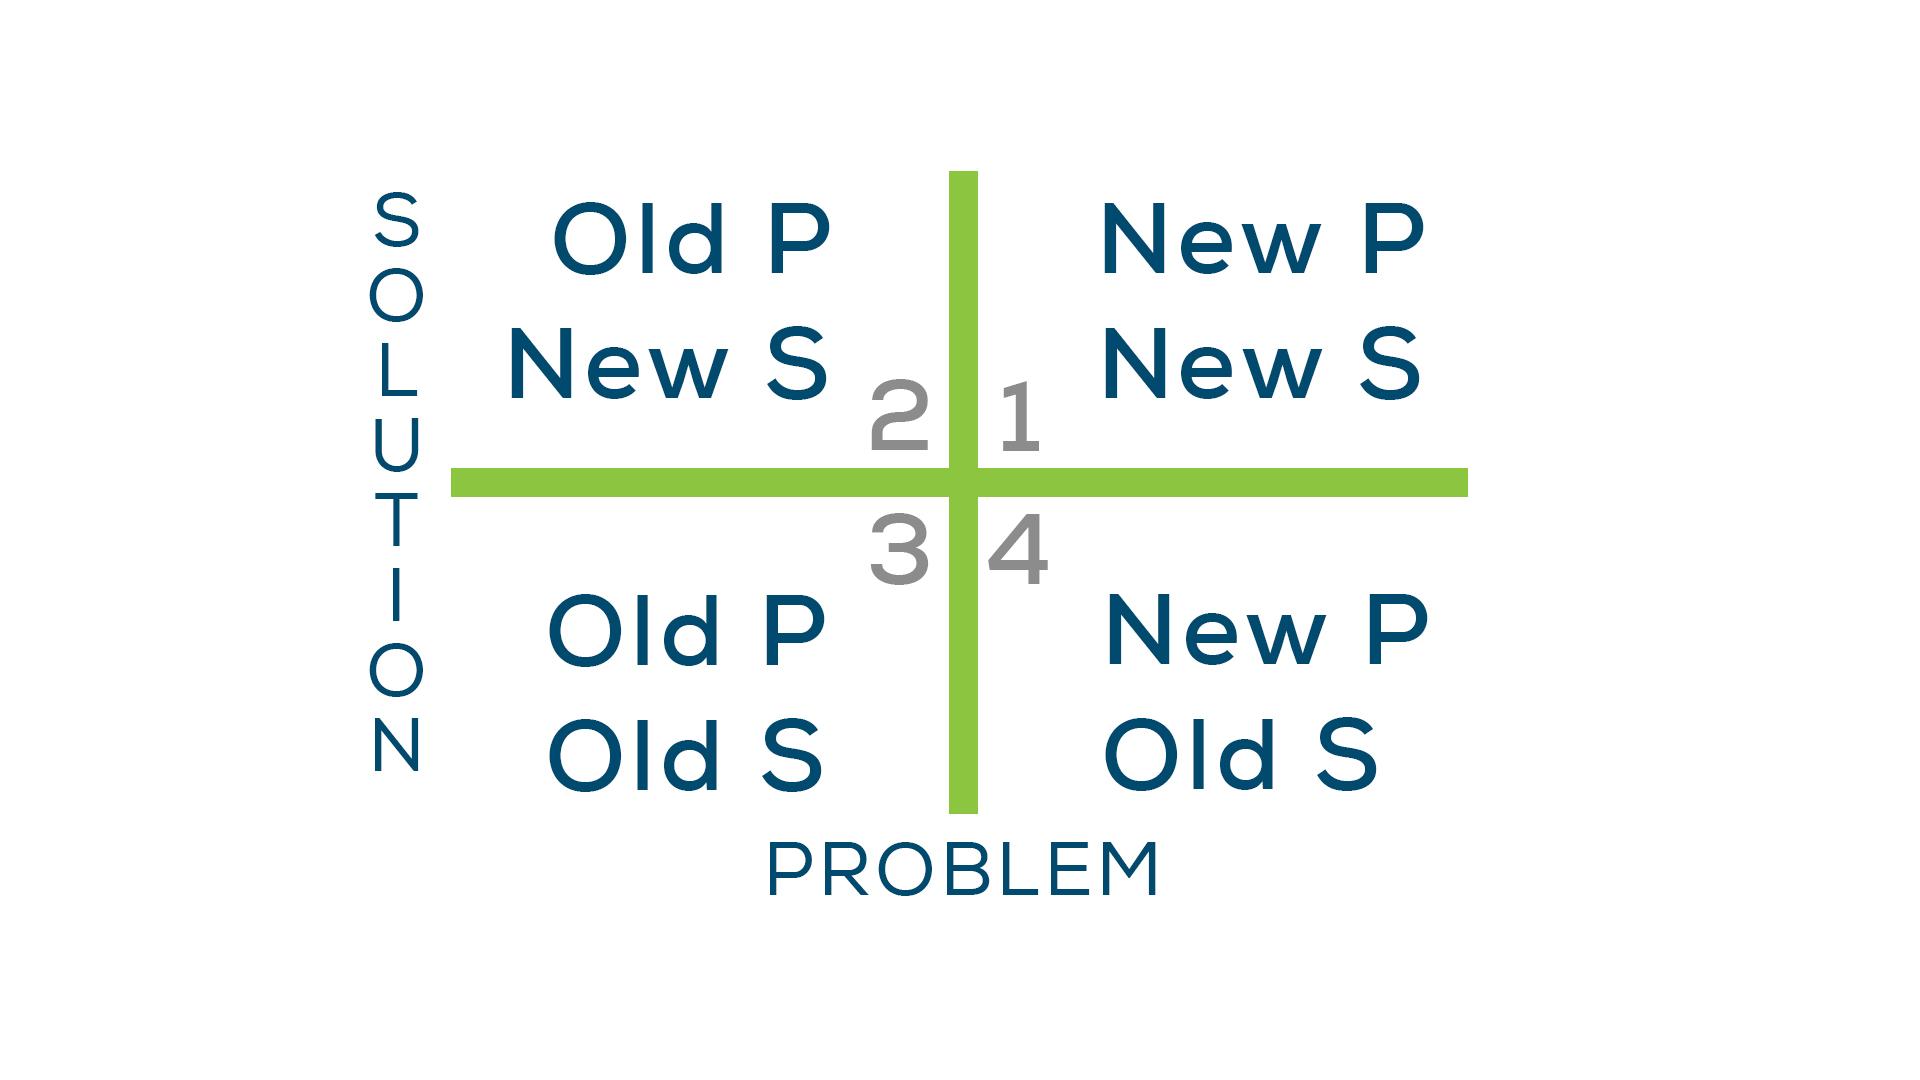 Problem-Solution Matrix